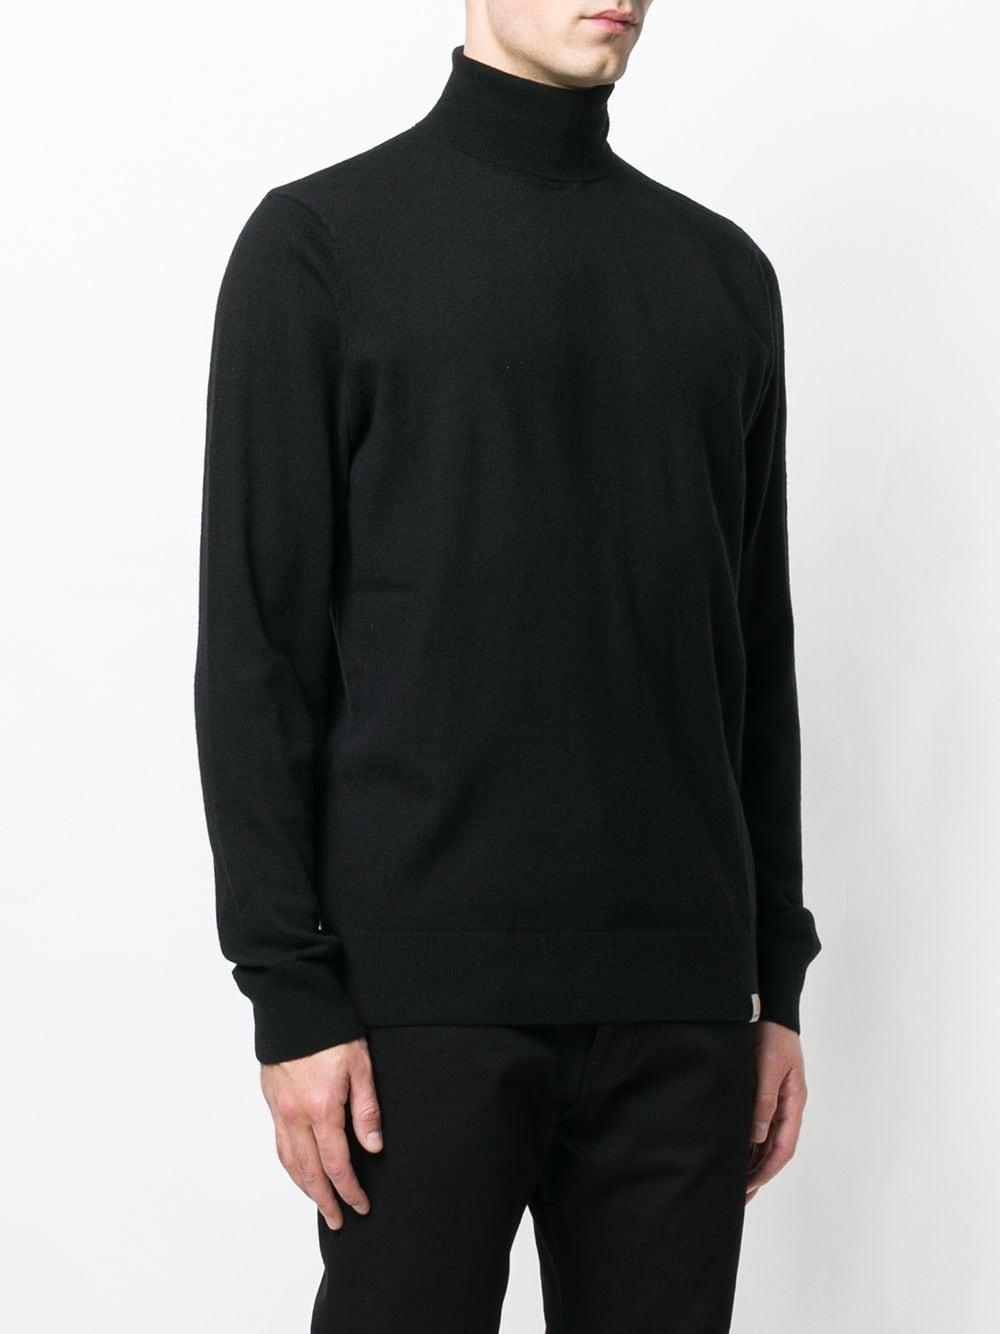 turtleneck sweater man black in wool CARHARTT WIP | Sweaters | I02336889.XX